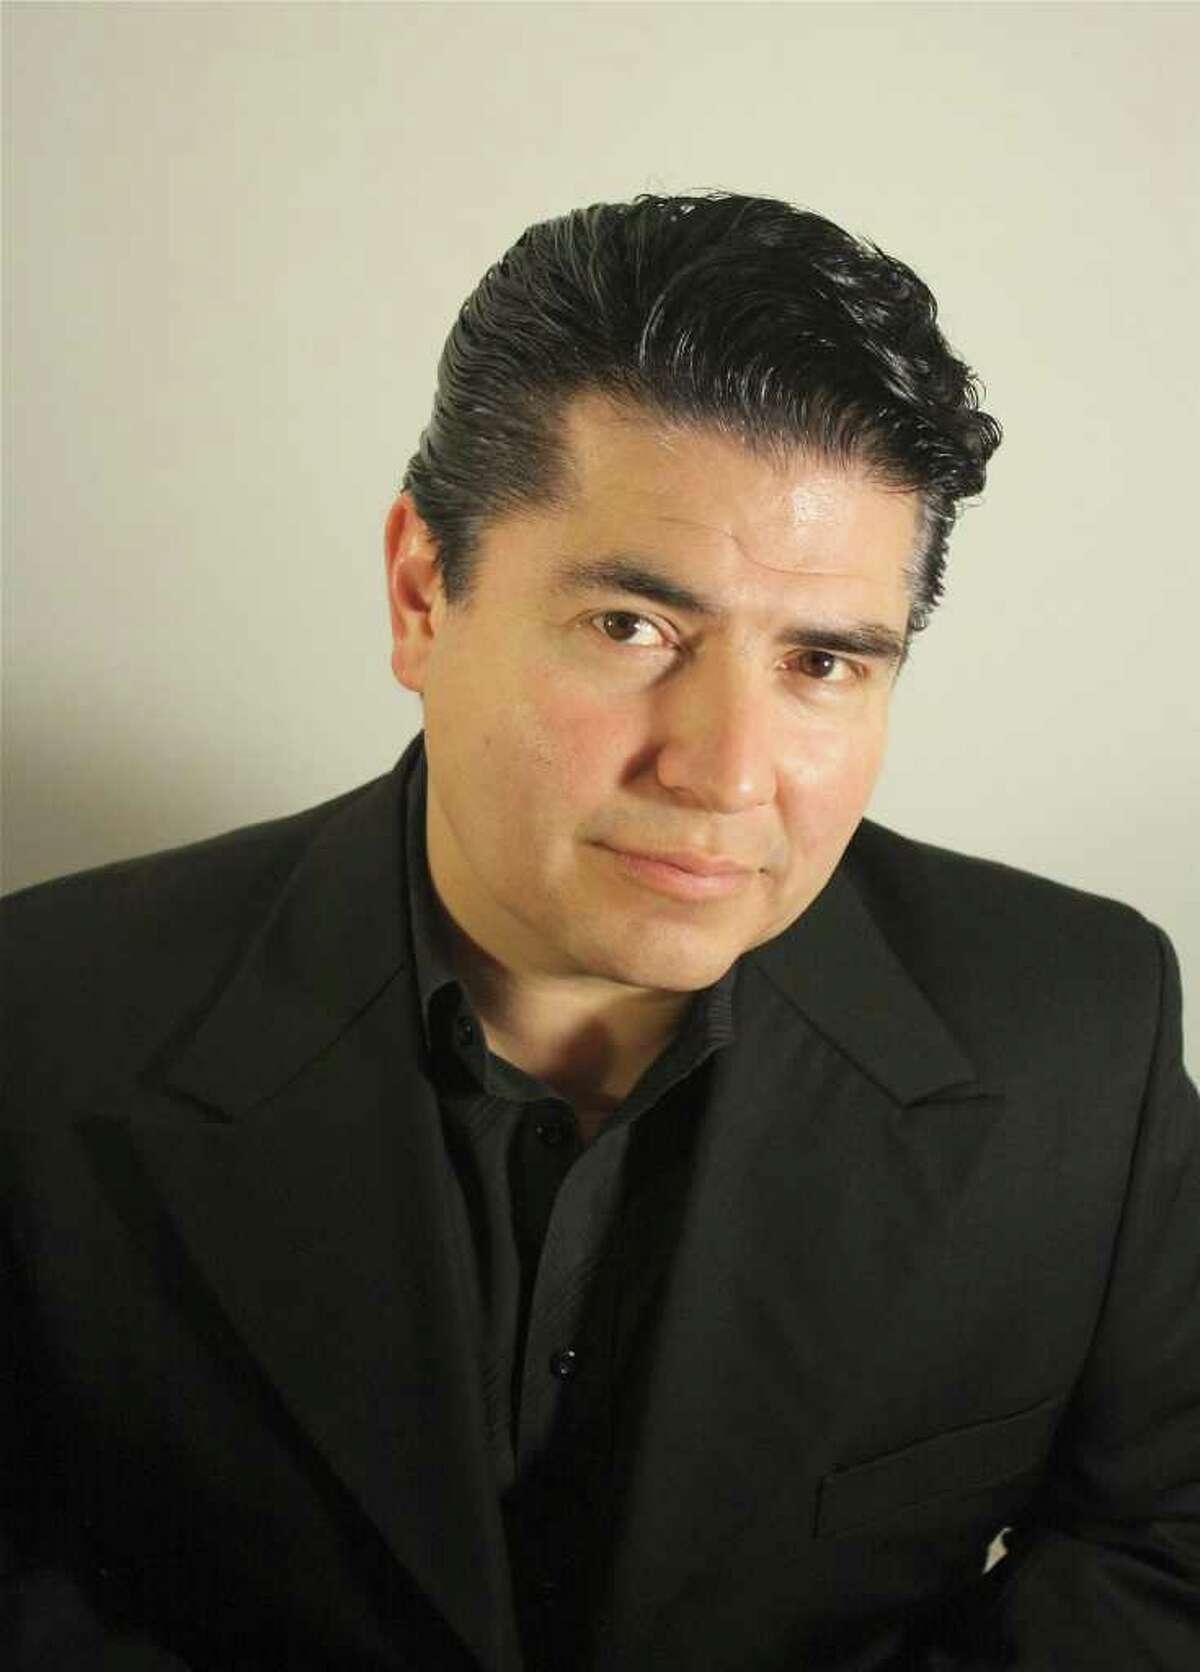 Carlos Taboada has recorded a CD of Tejano oldies.